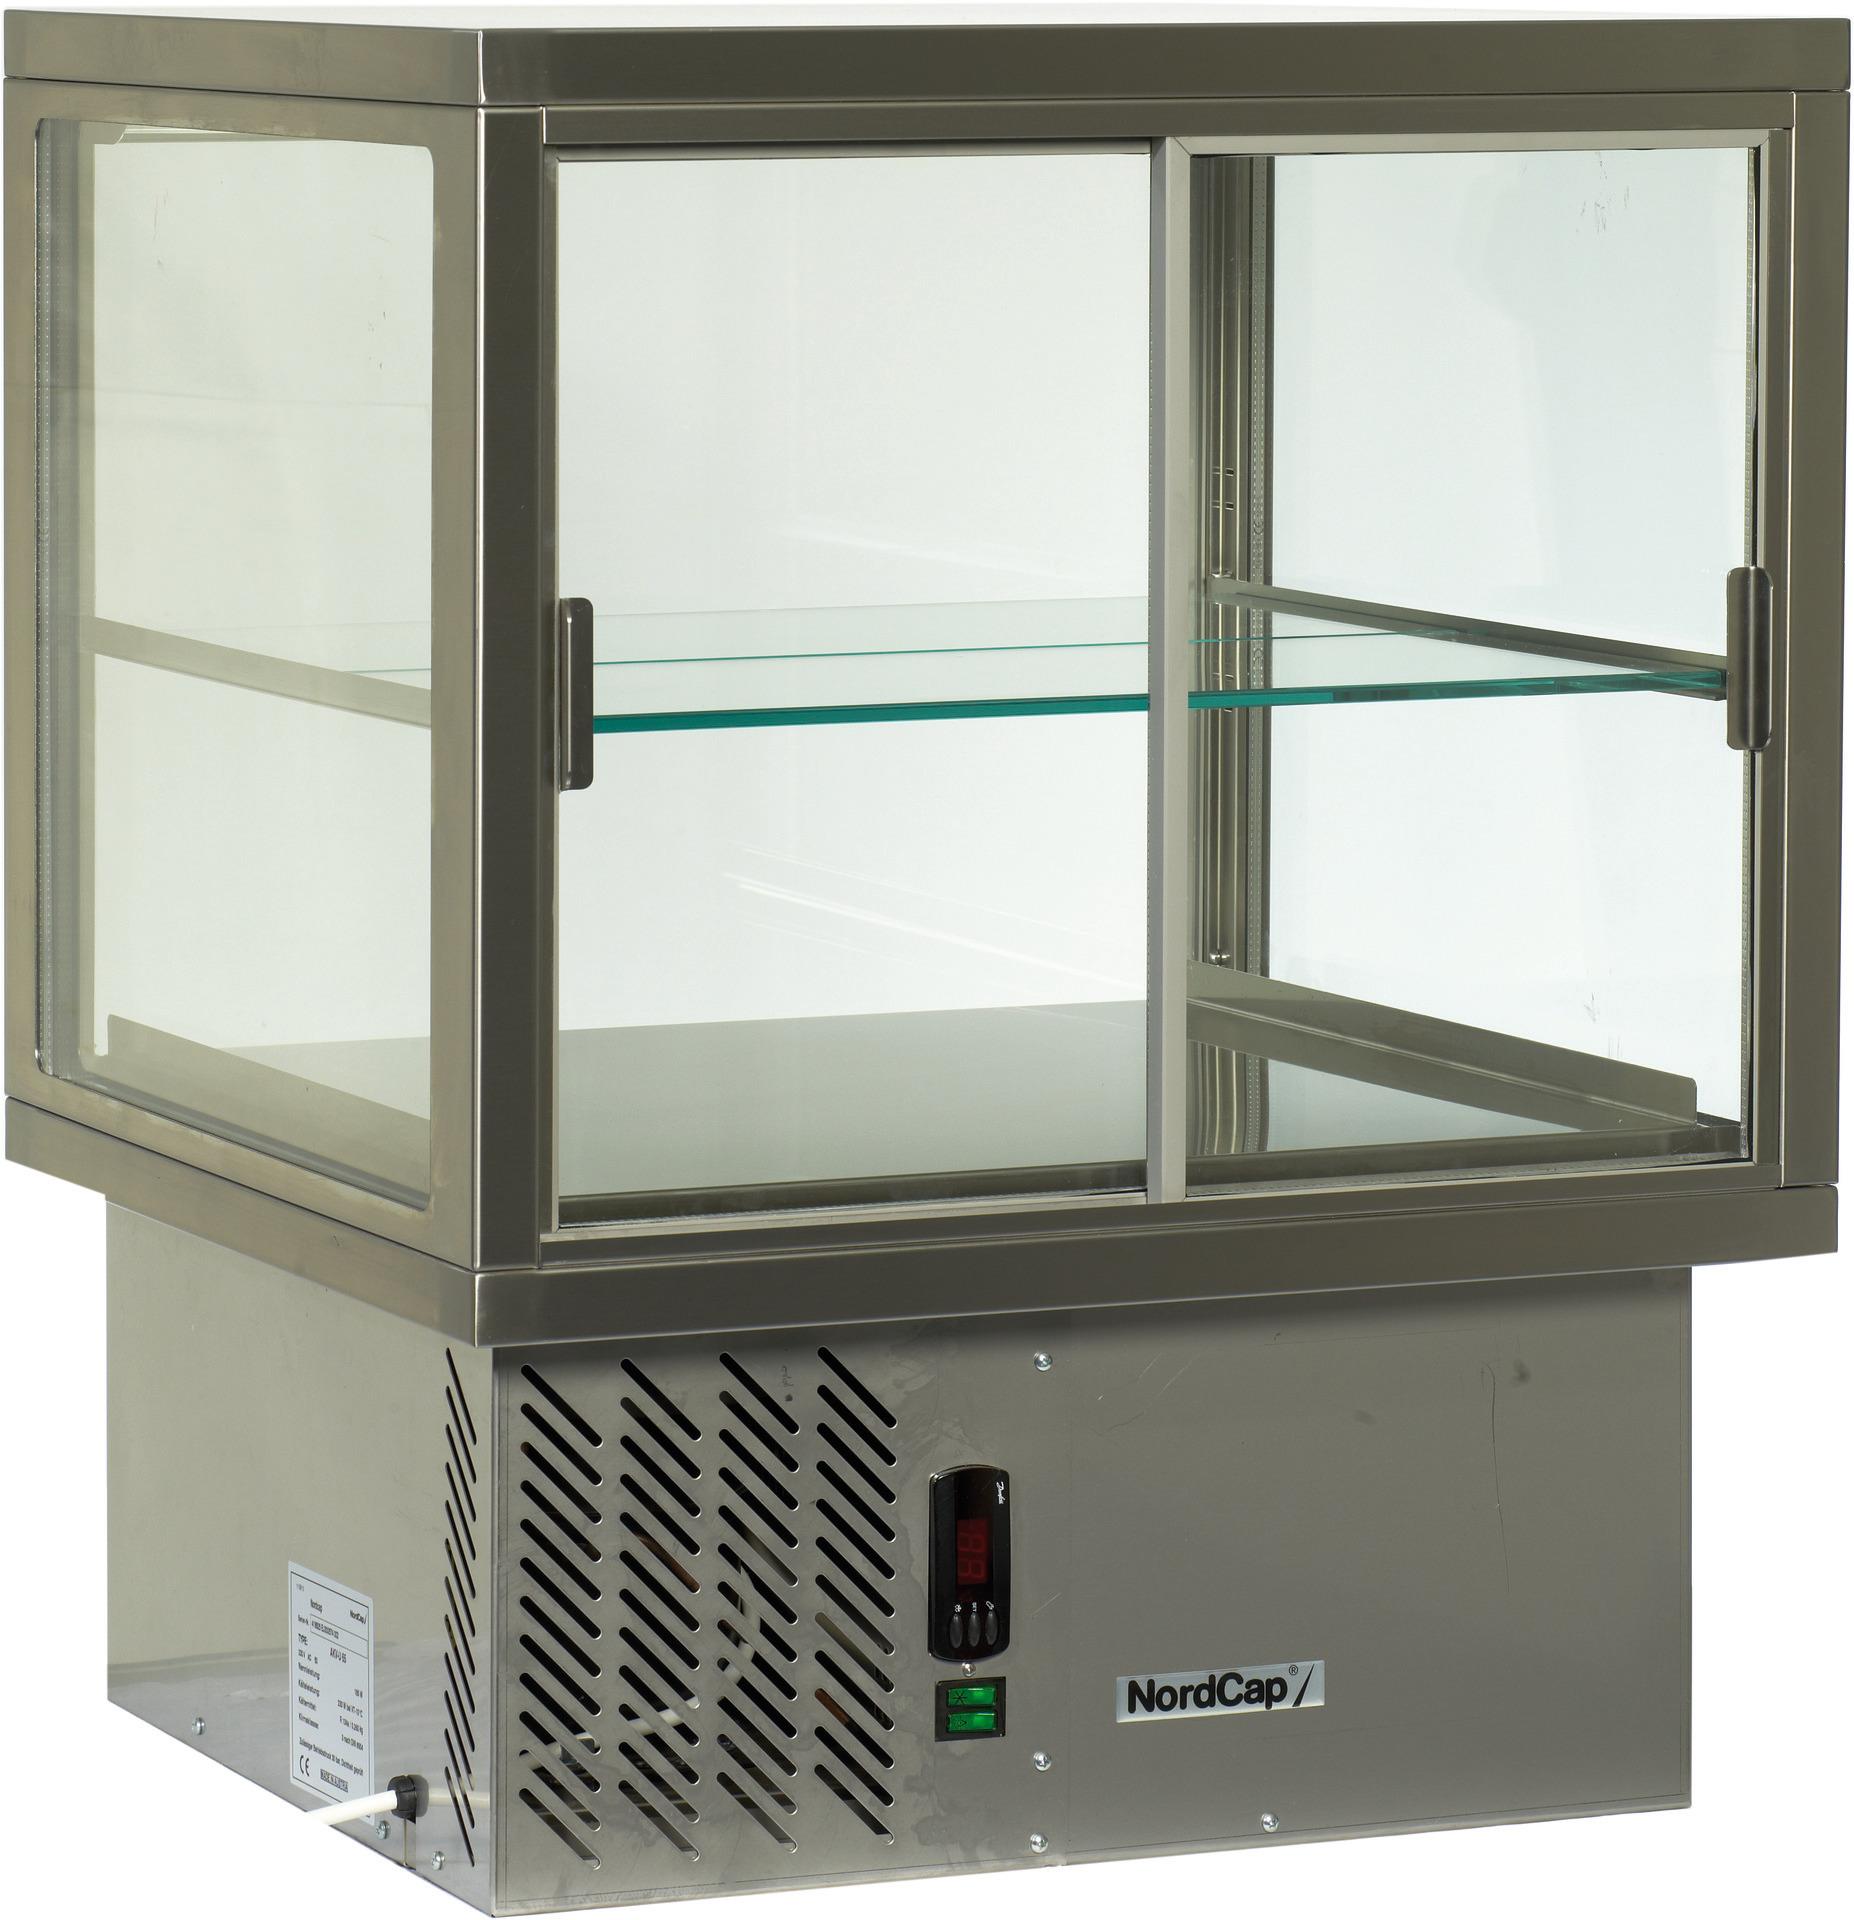 Aufsatzkühlvitrine 4-seitig verglast /  Nettoinhalt 190,00 l / steckerfertig